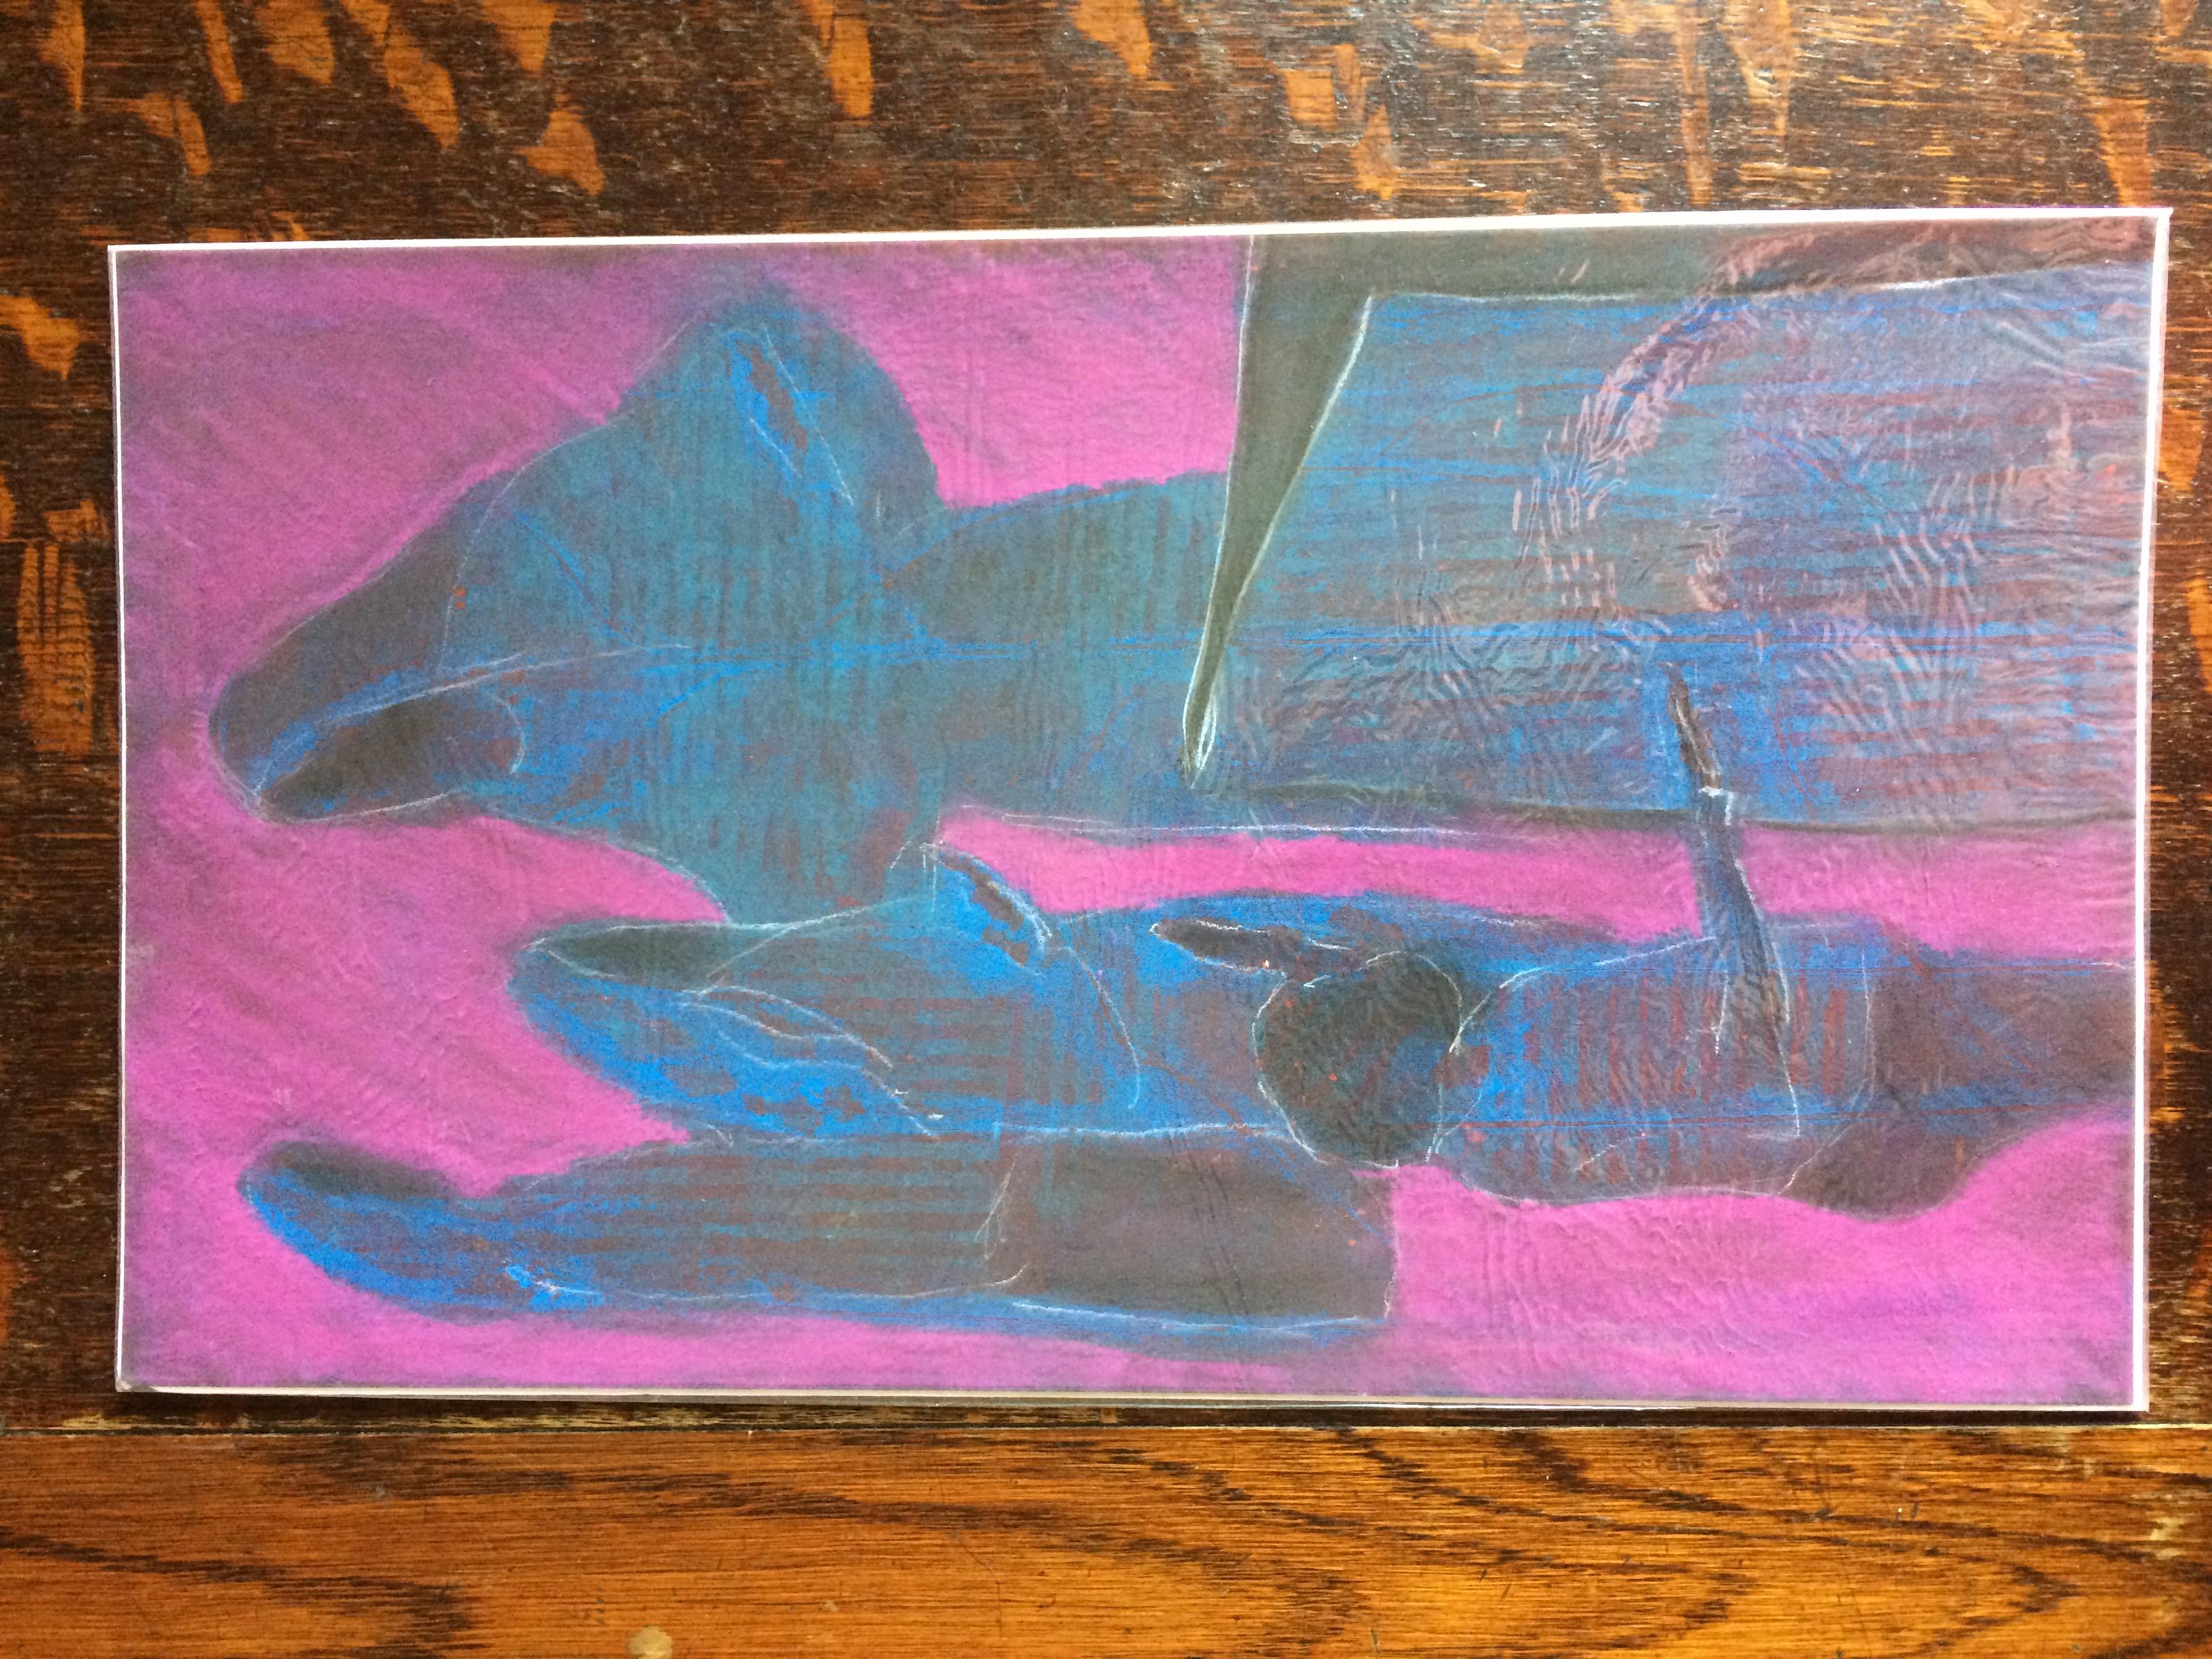 031 Print Pastel 43 x 25